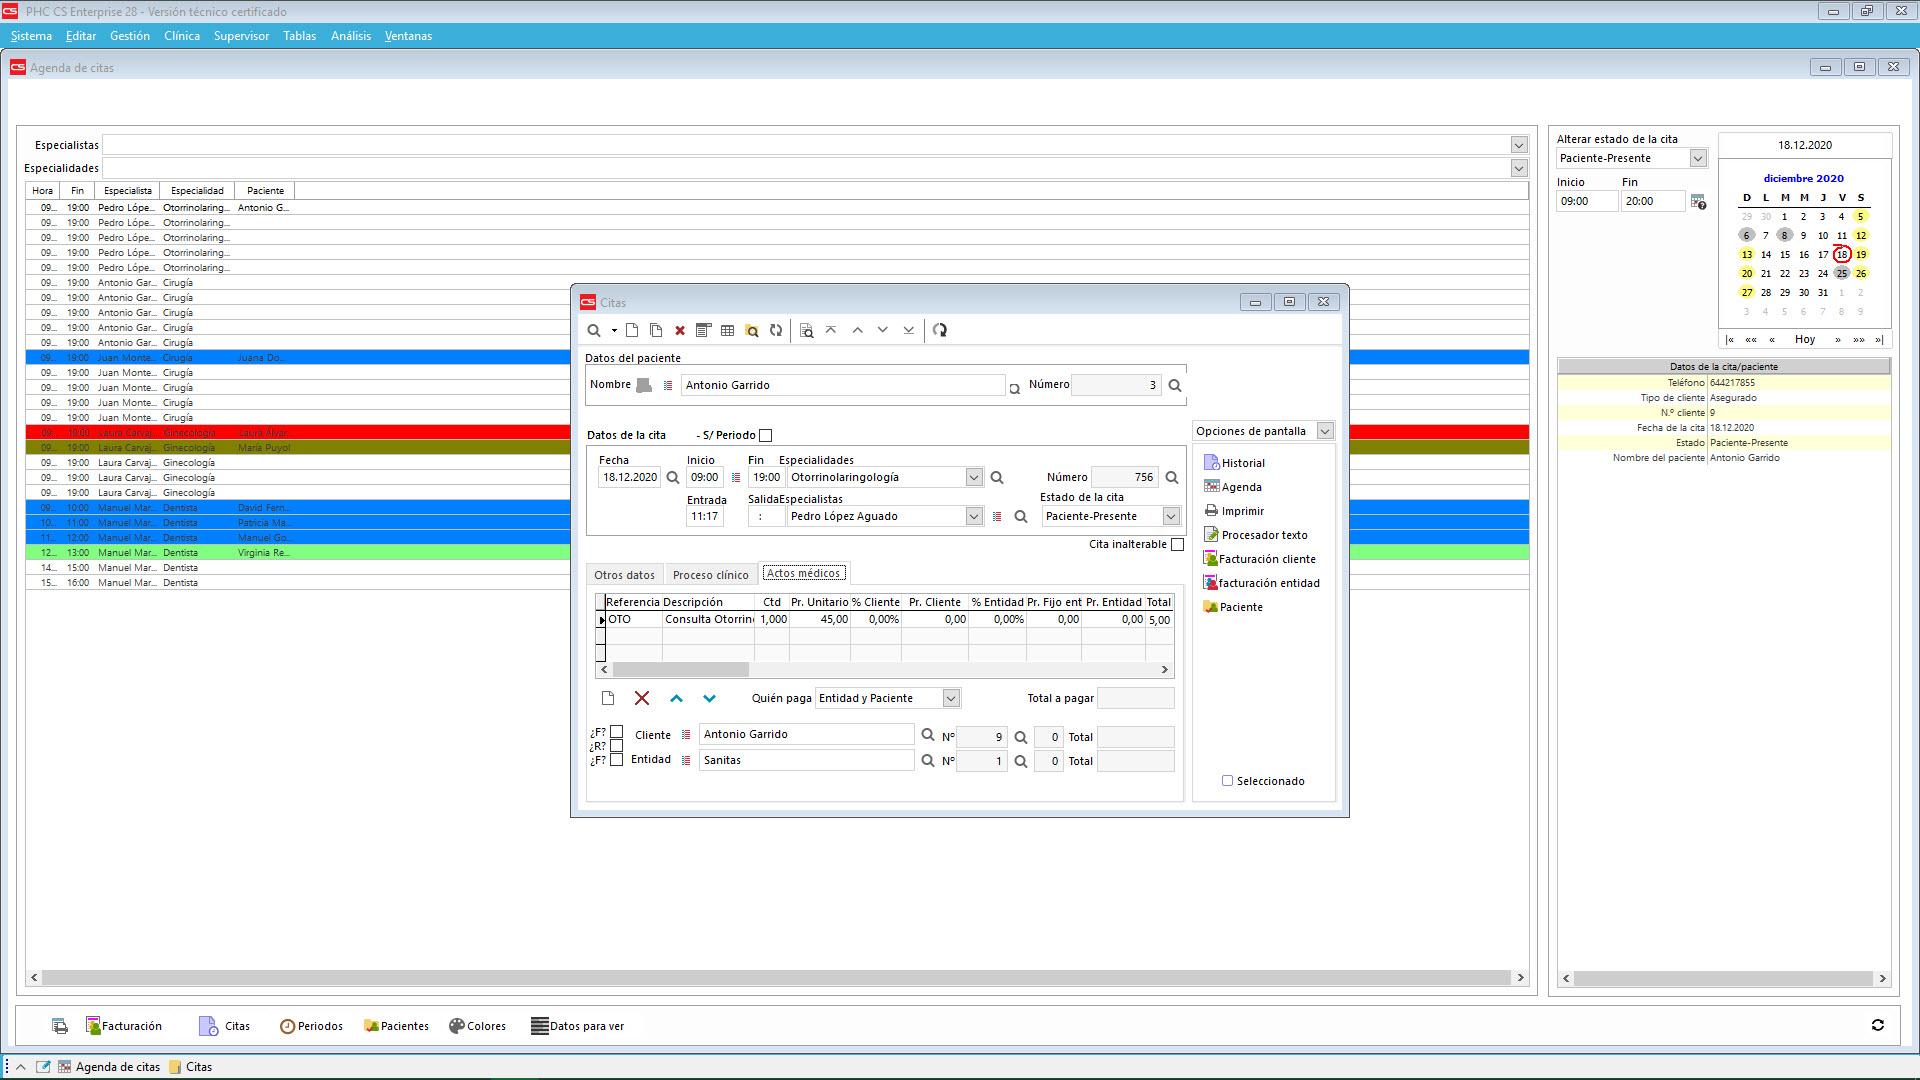 Software de gestión PHC CS con agenda para citas